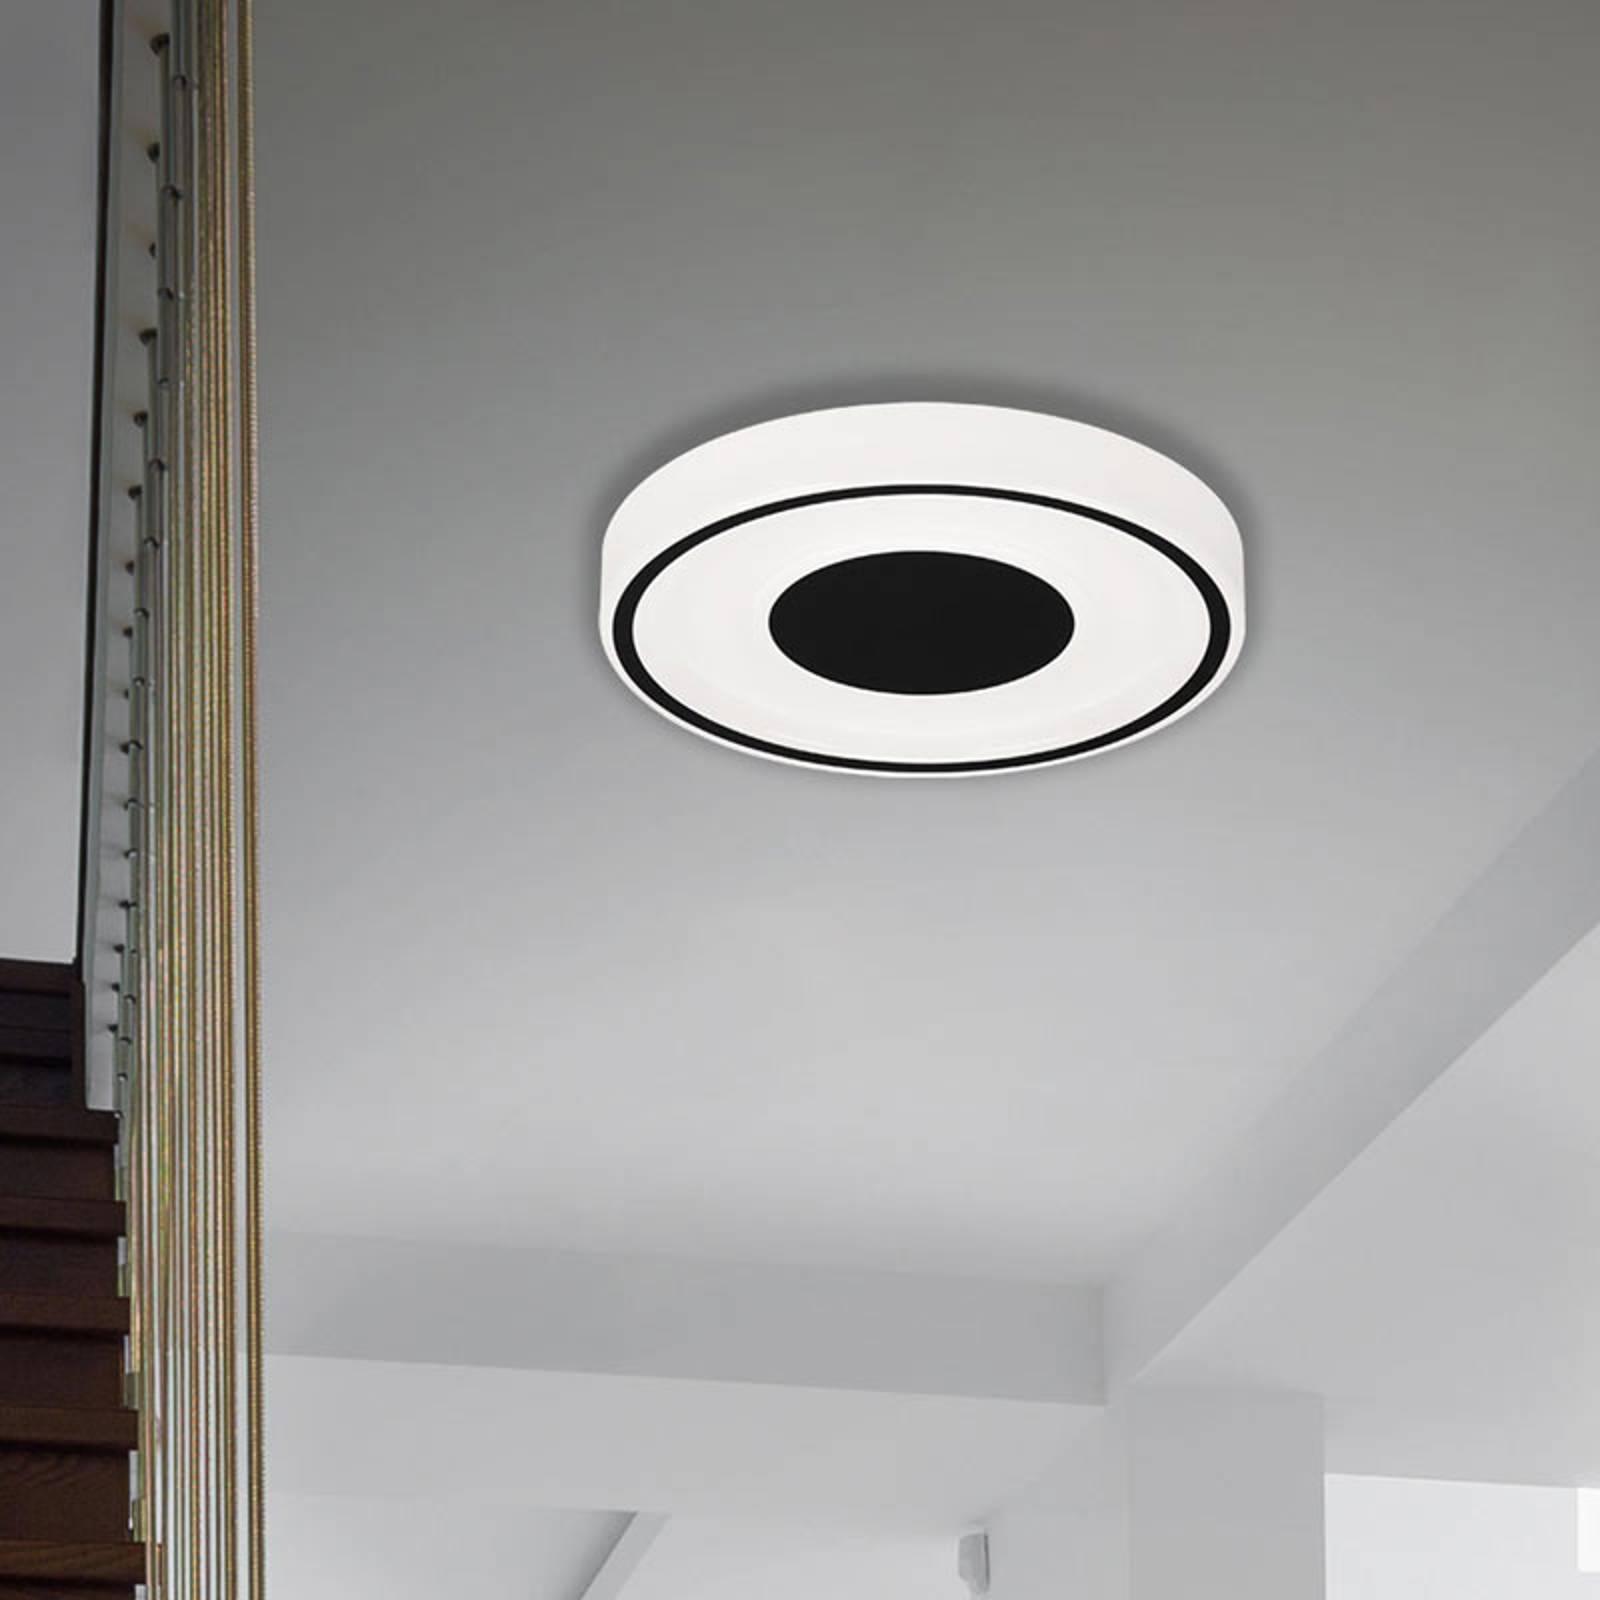 LED plafondlamp Bricks, rond, zwart